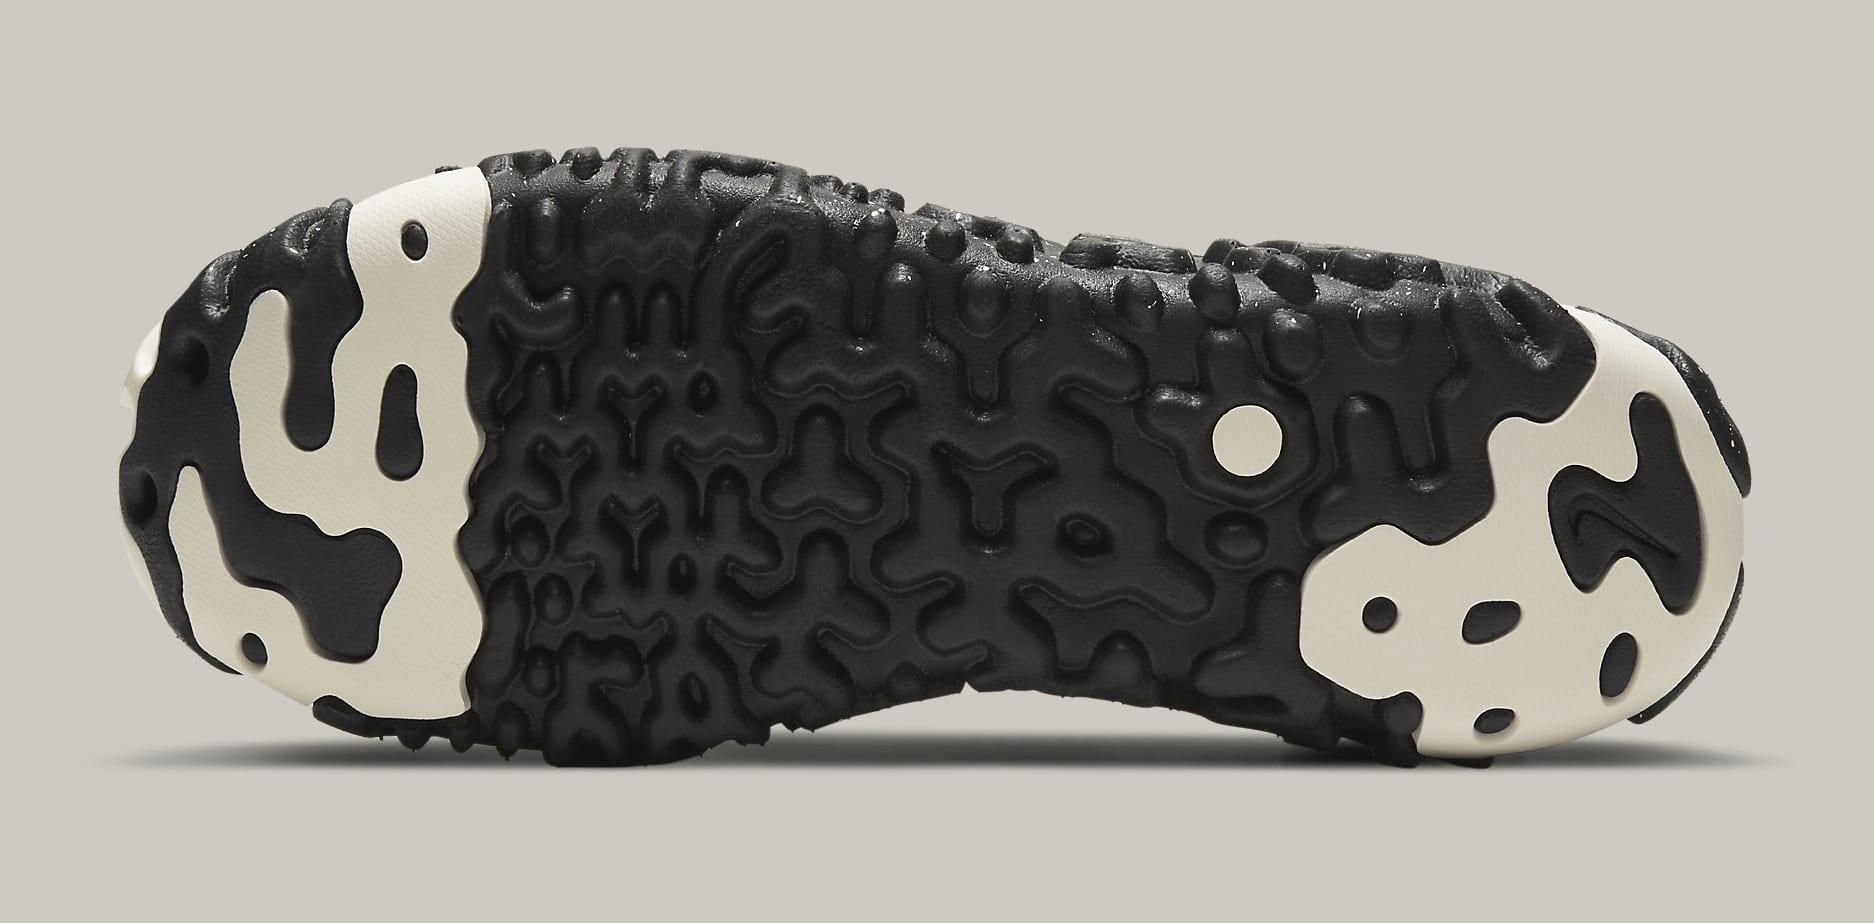 Undercover x Nike Overbreak SP 'Black' DD1789-001 Outsole